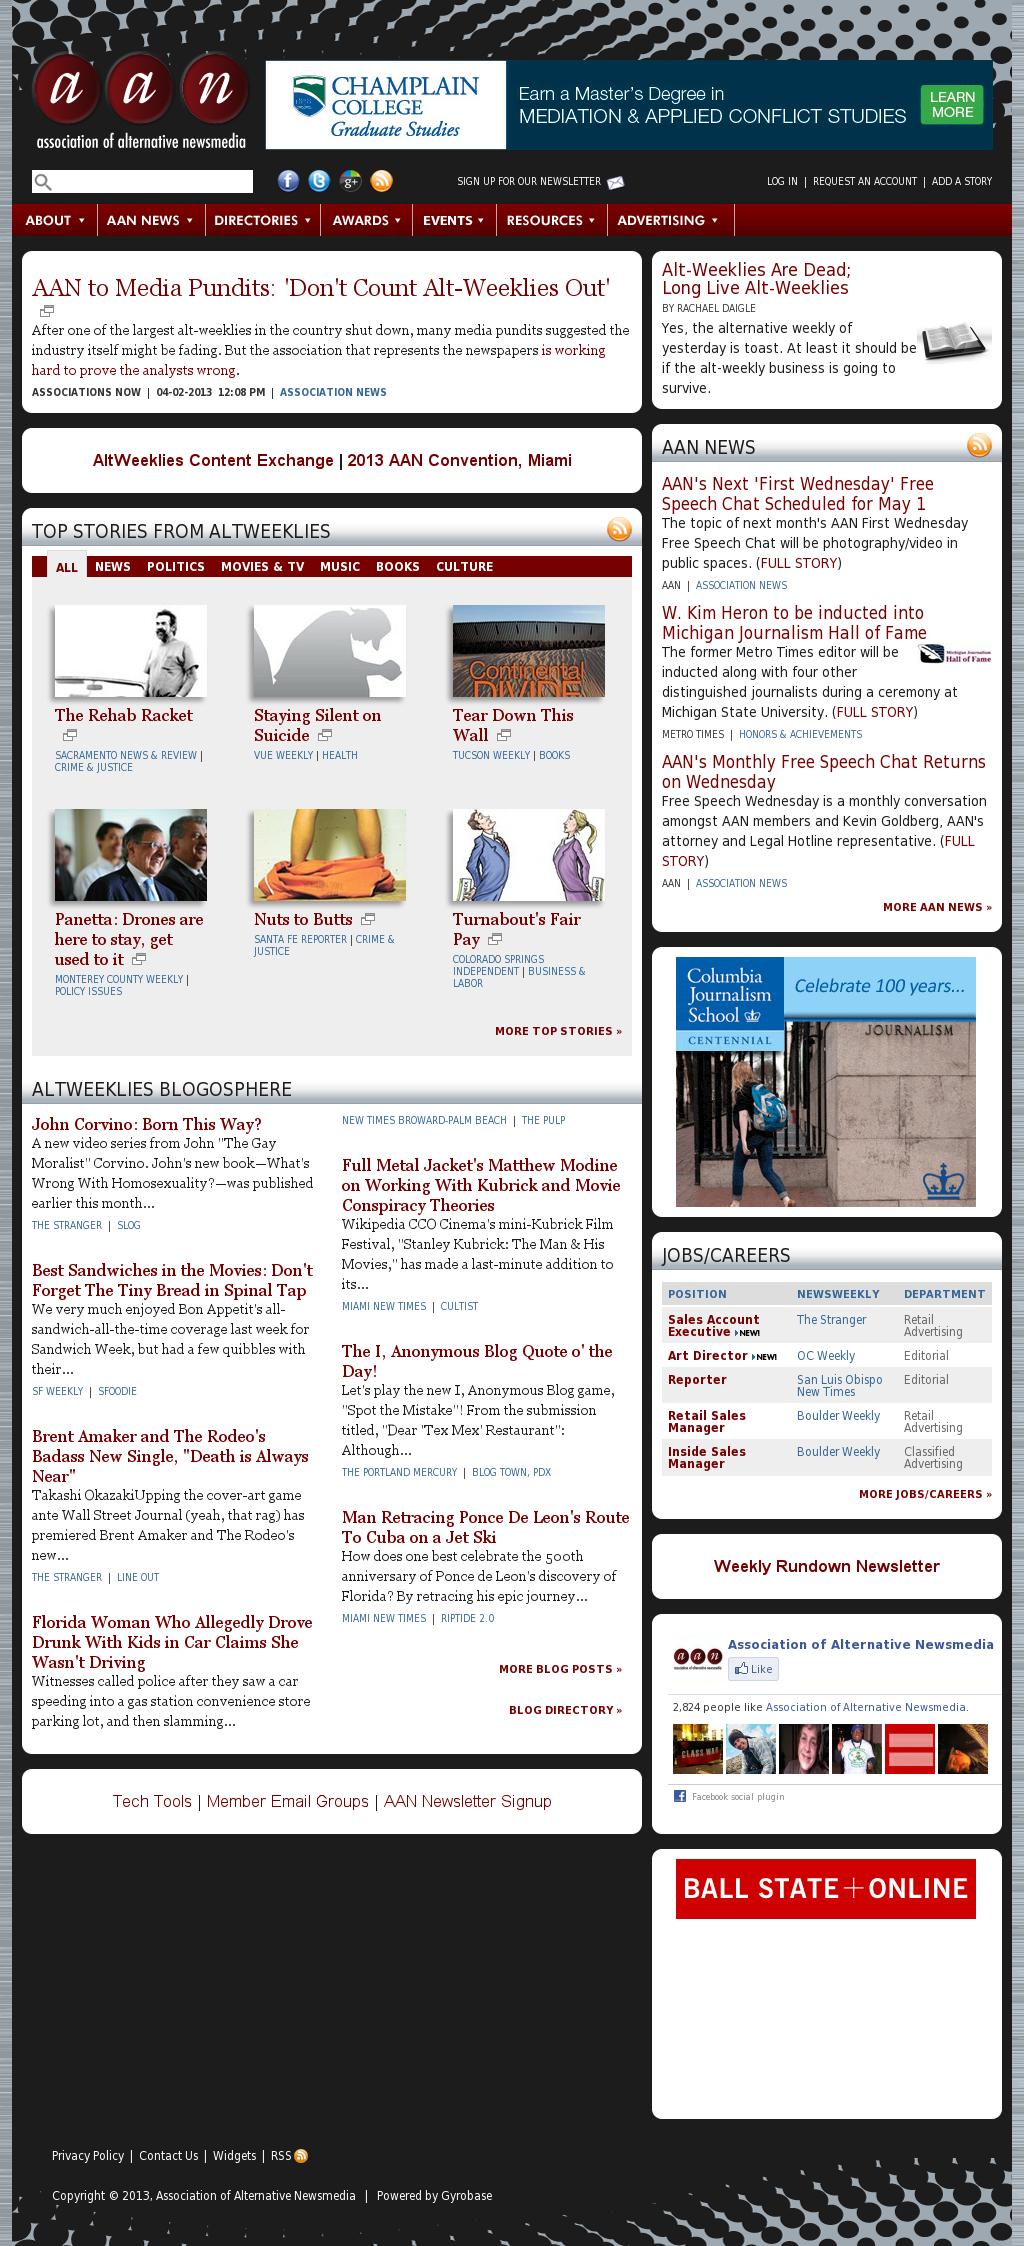 Association of Alternative Newsmedia at Tuesday April 9, 2013, 2 a.m. UTC